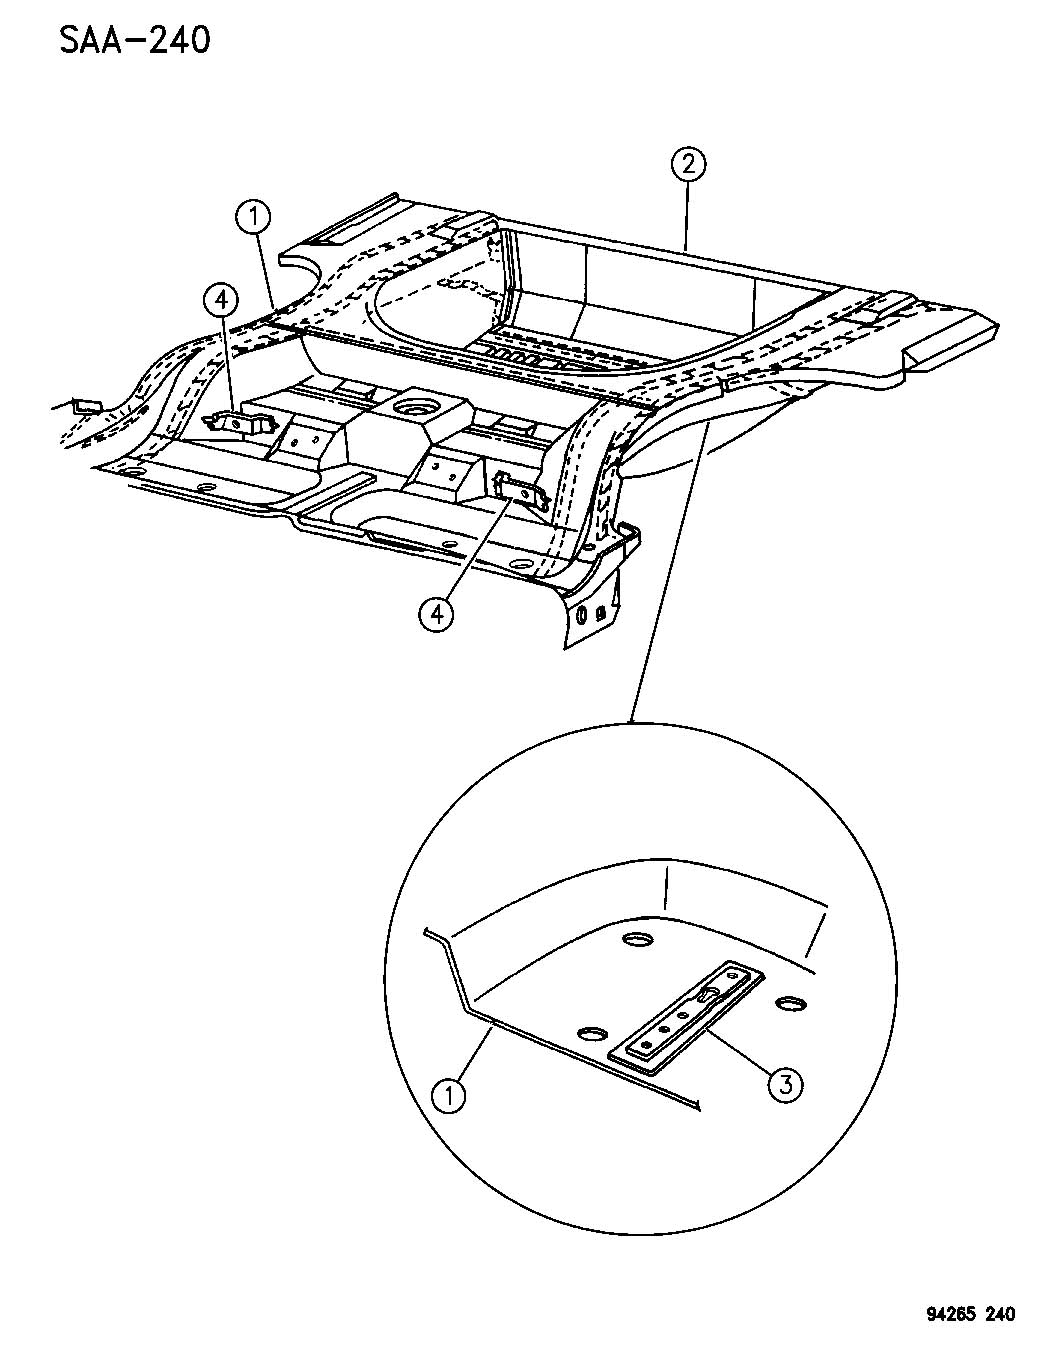 1994 chrysler lebaron floor pan rear a body 41 for 1994 jeep cherokee floor pans